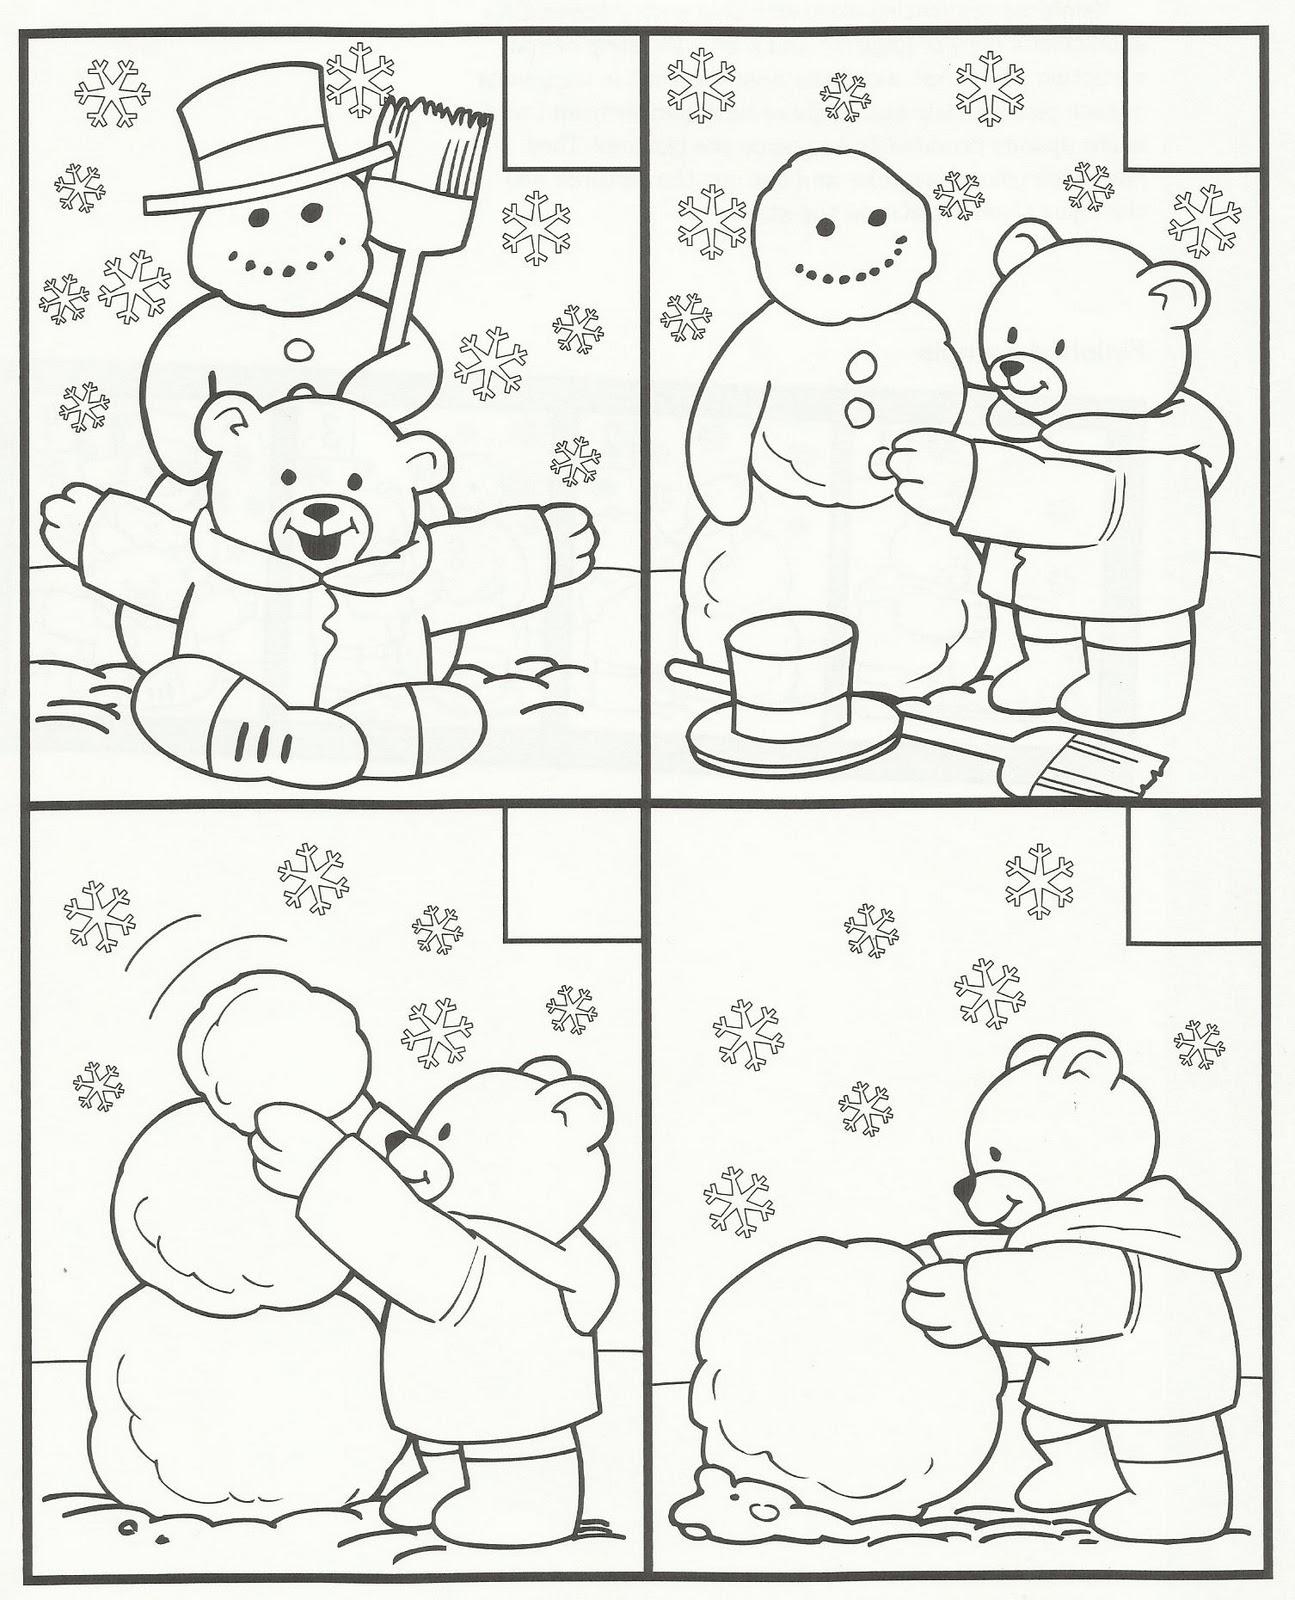 Winter2 1 295 1 600 Pixels